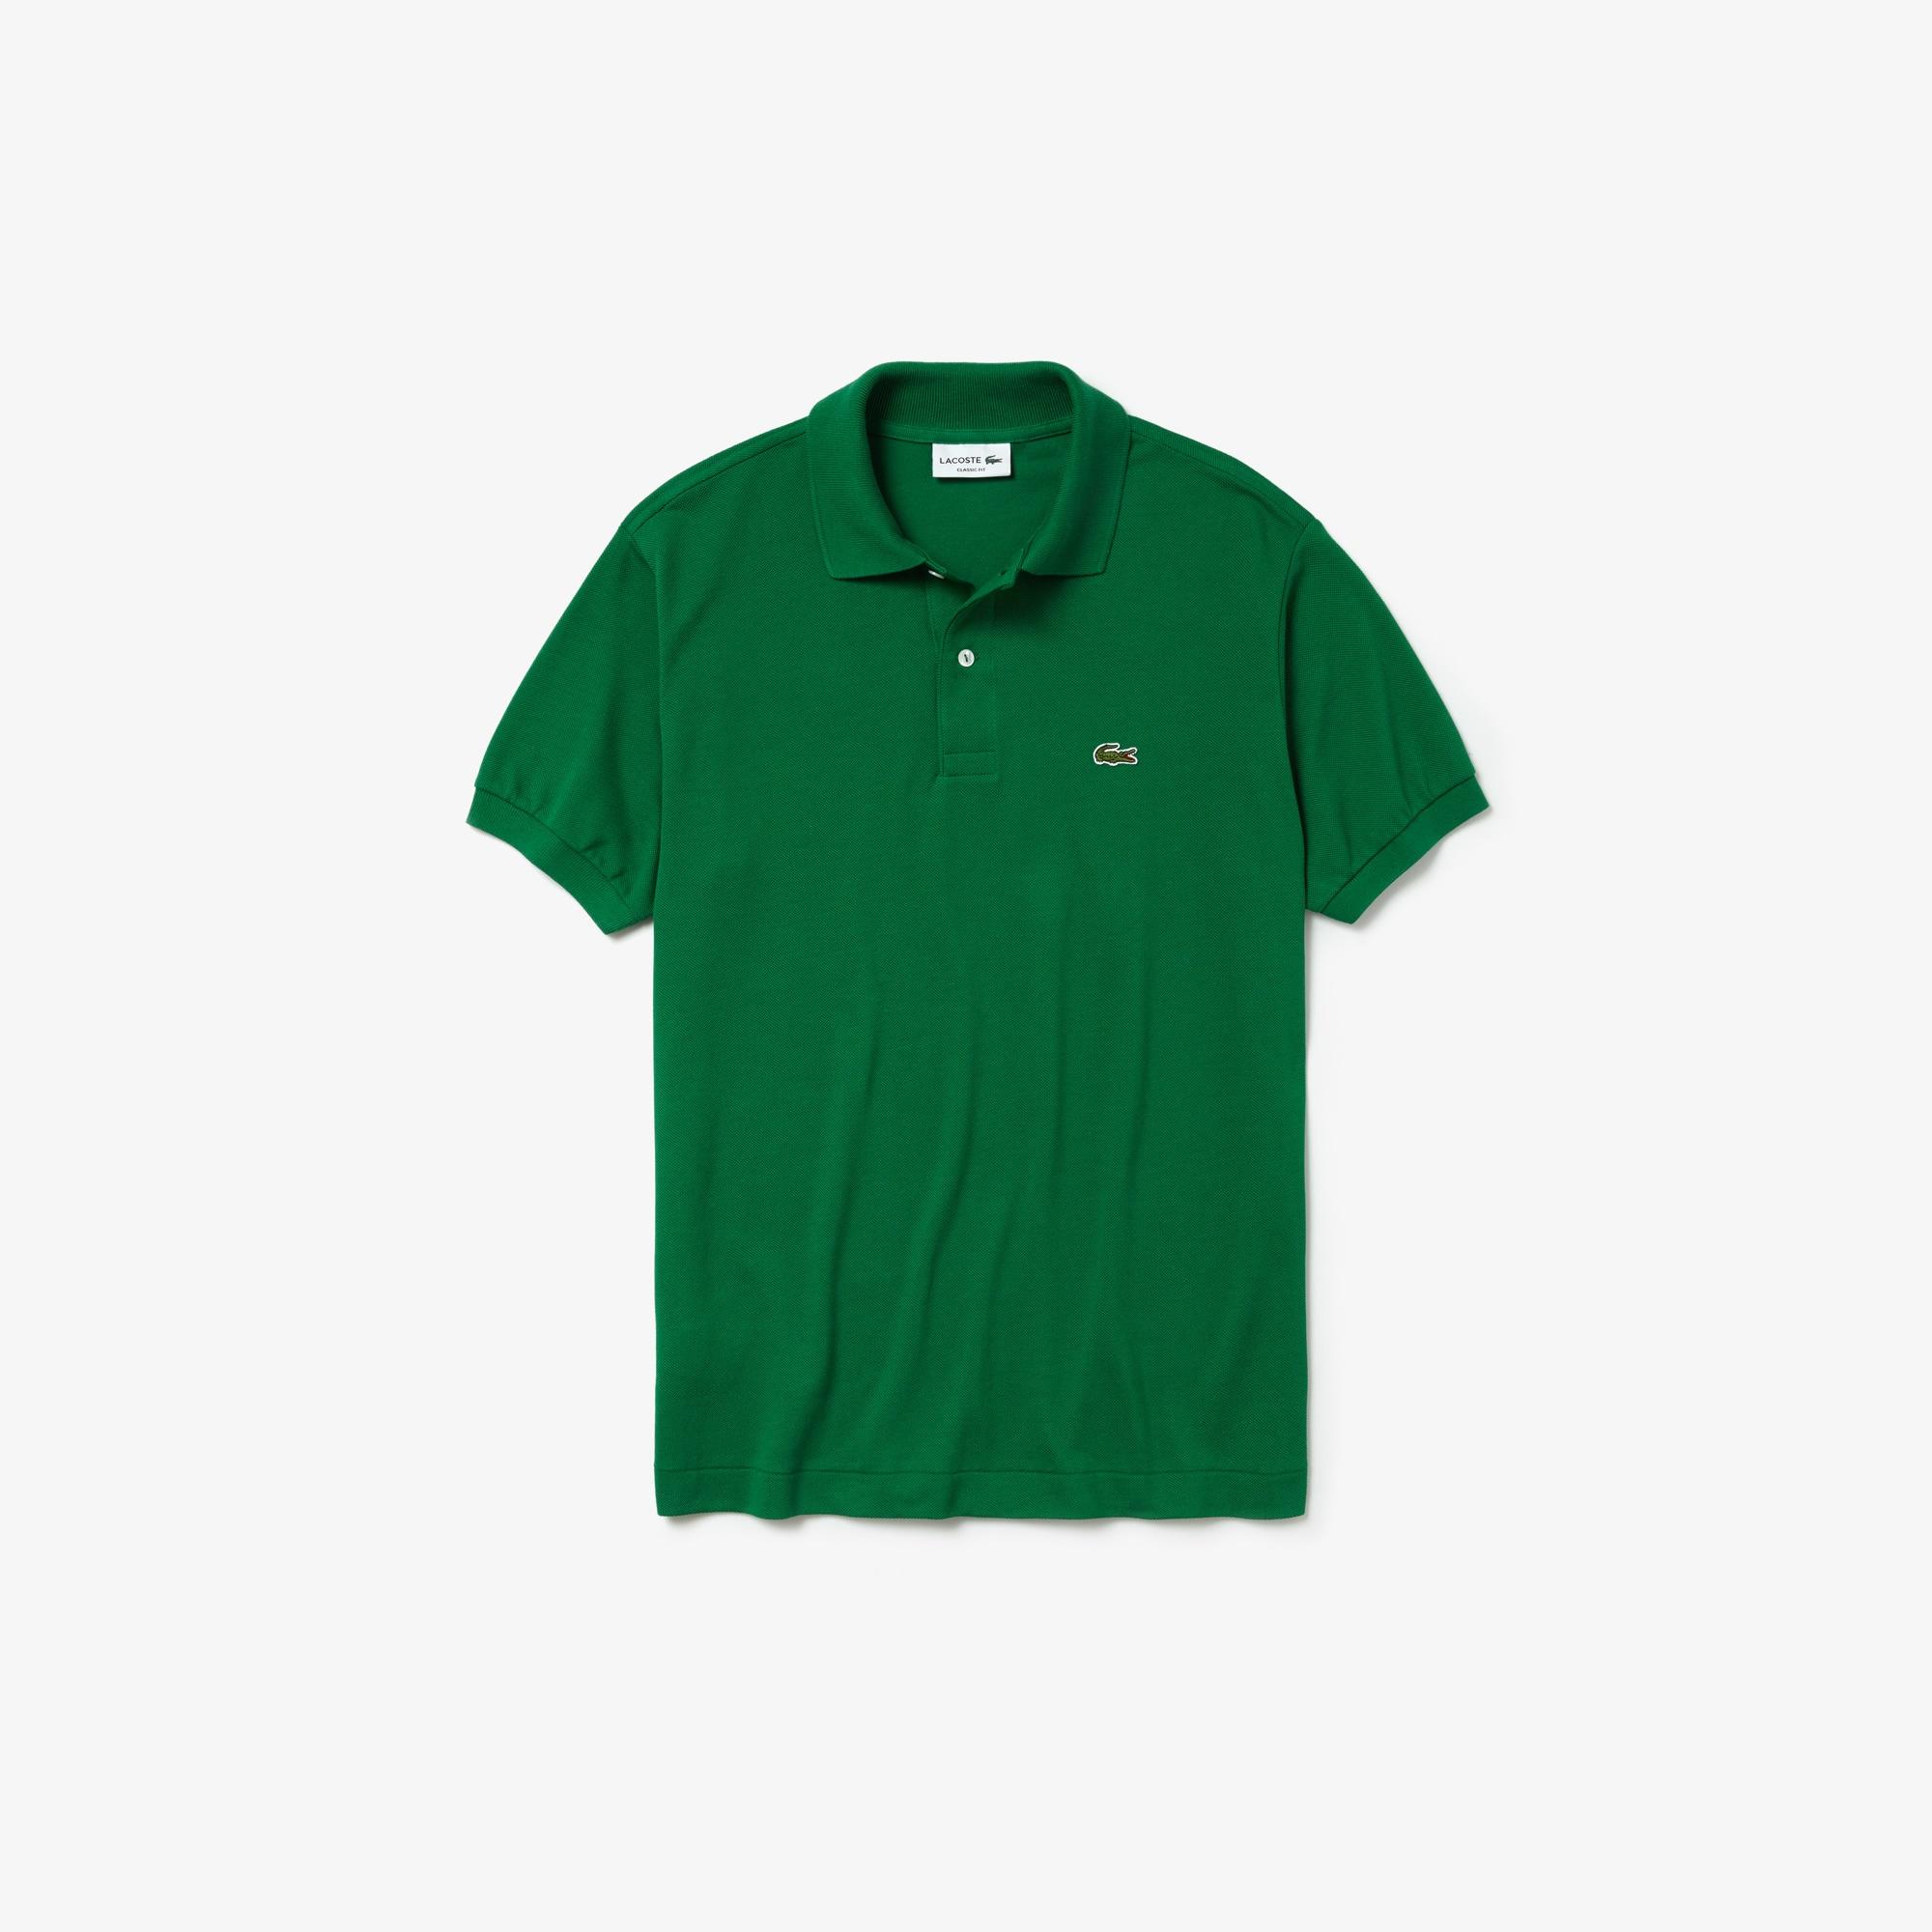 934efd9dc Men s Clothing Best Sellers